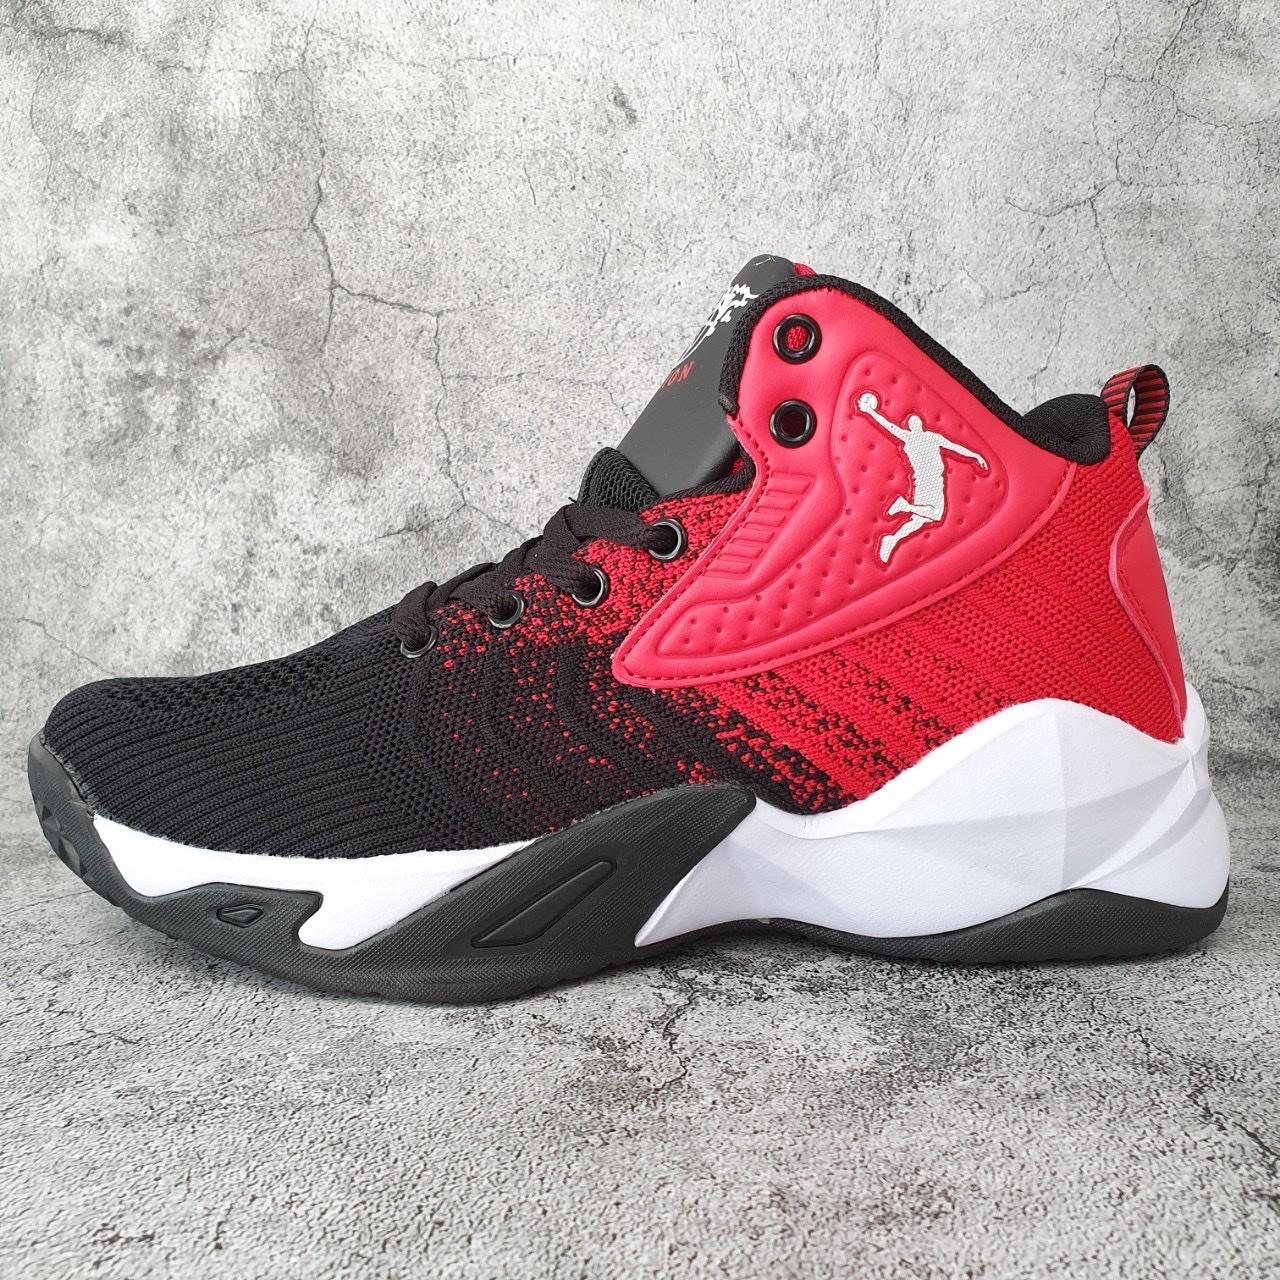 Giày bóng rổ trẻ em JYR01